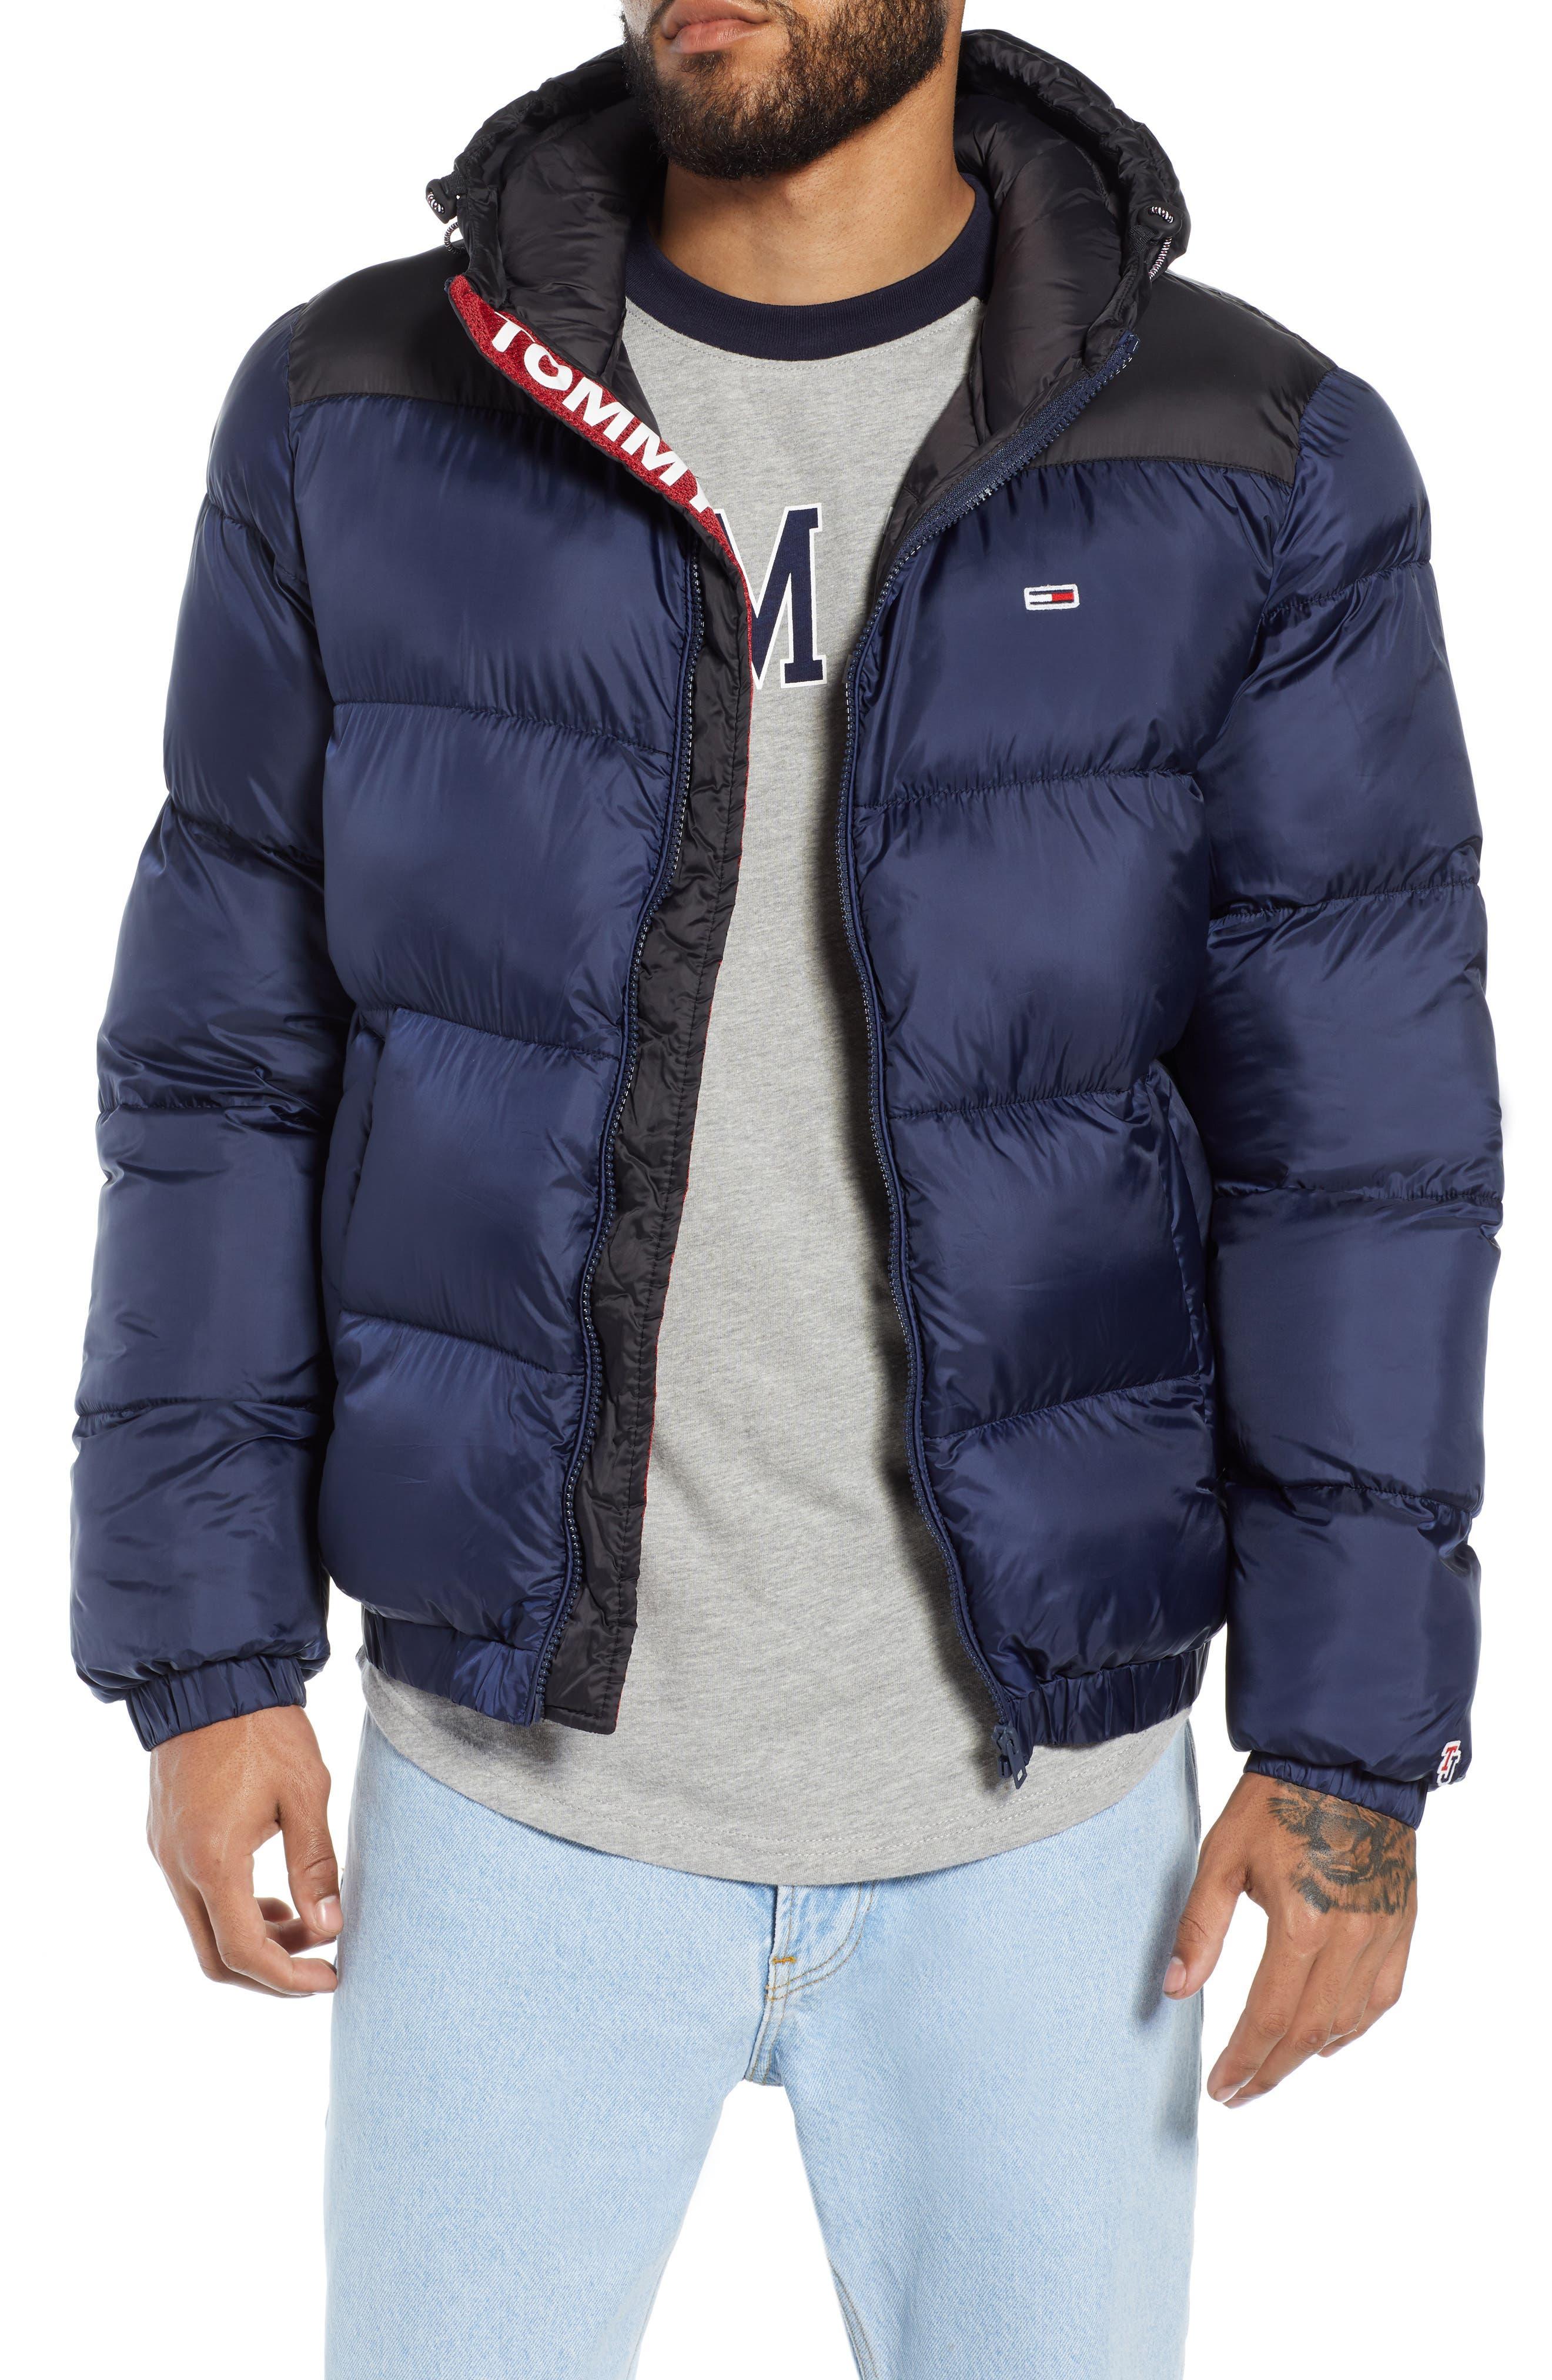 Classics Hooded Jacket,                         Main,                         color, 400